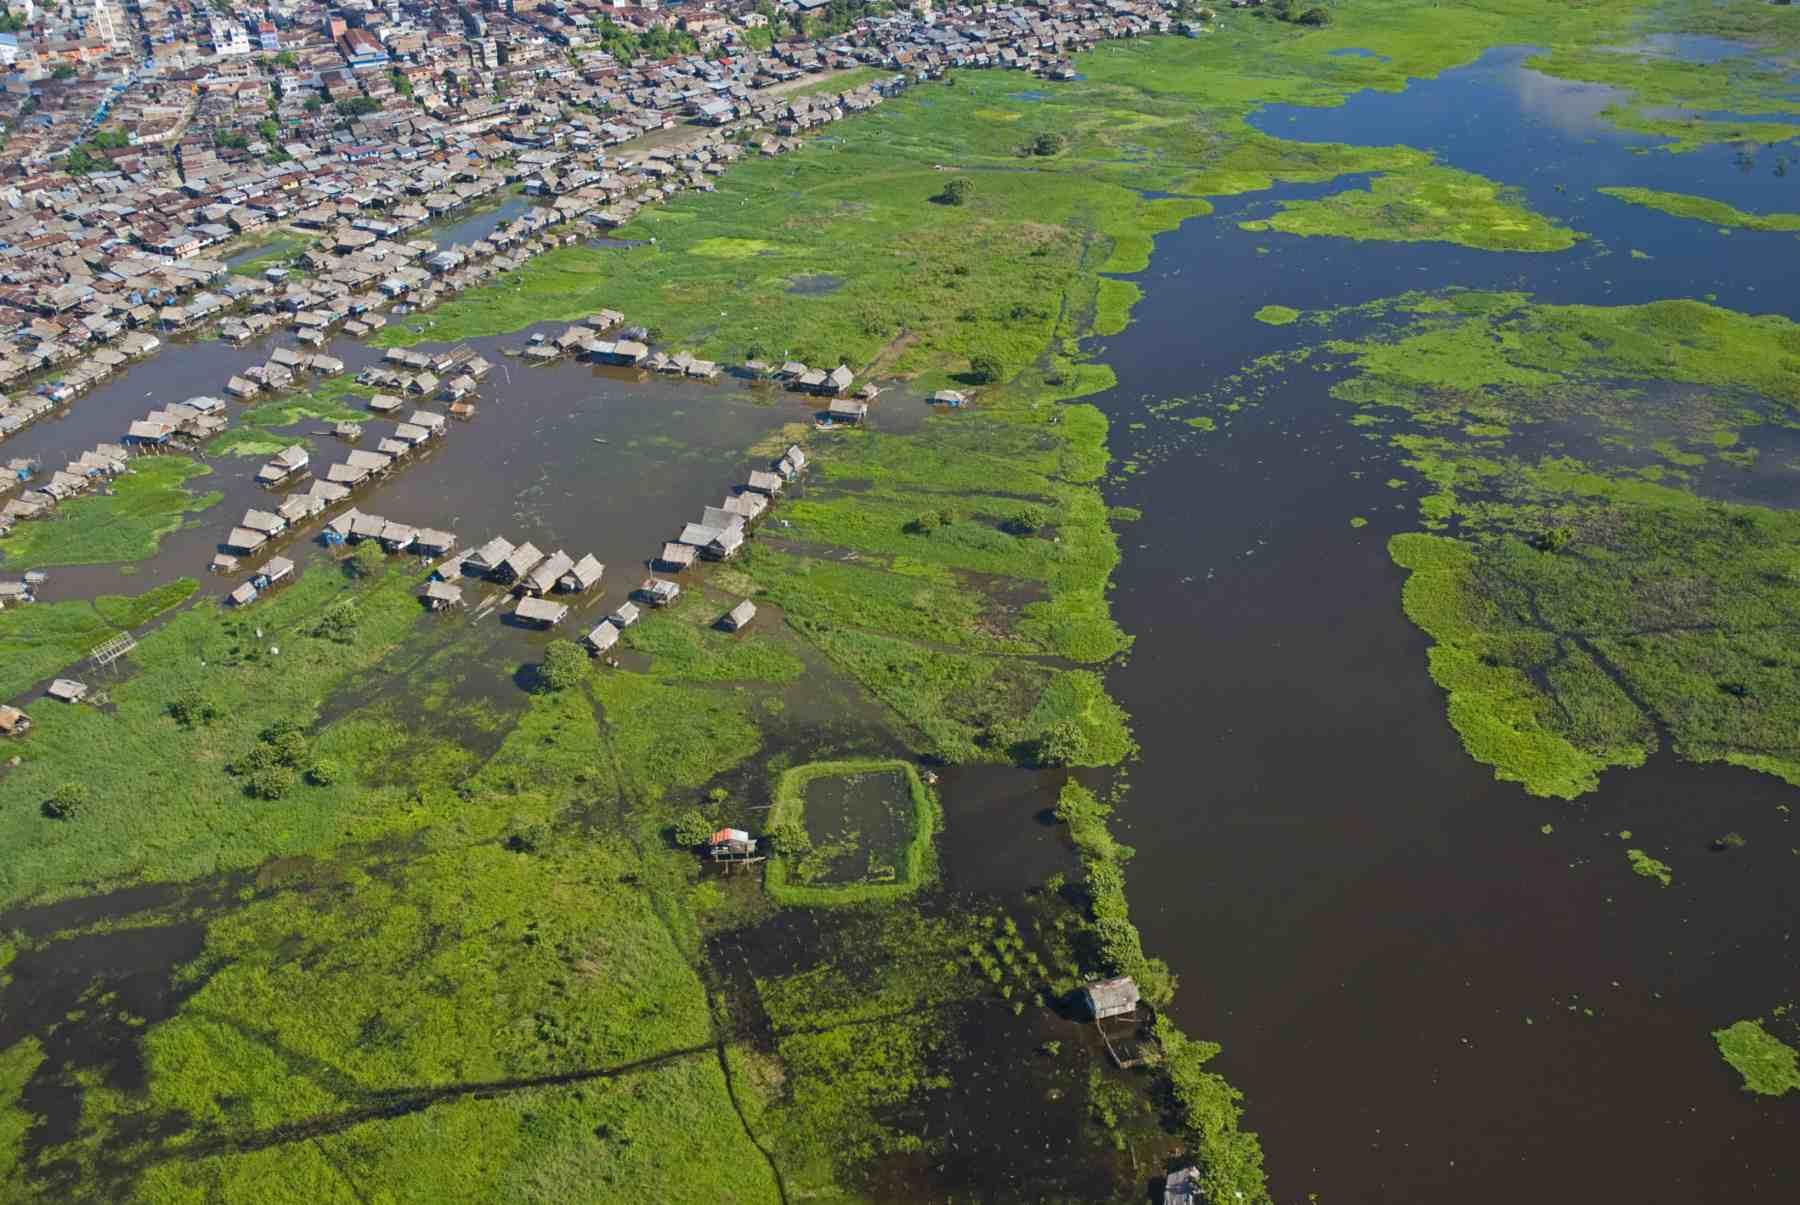 Aerial photo of Iquitos, Peru